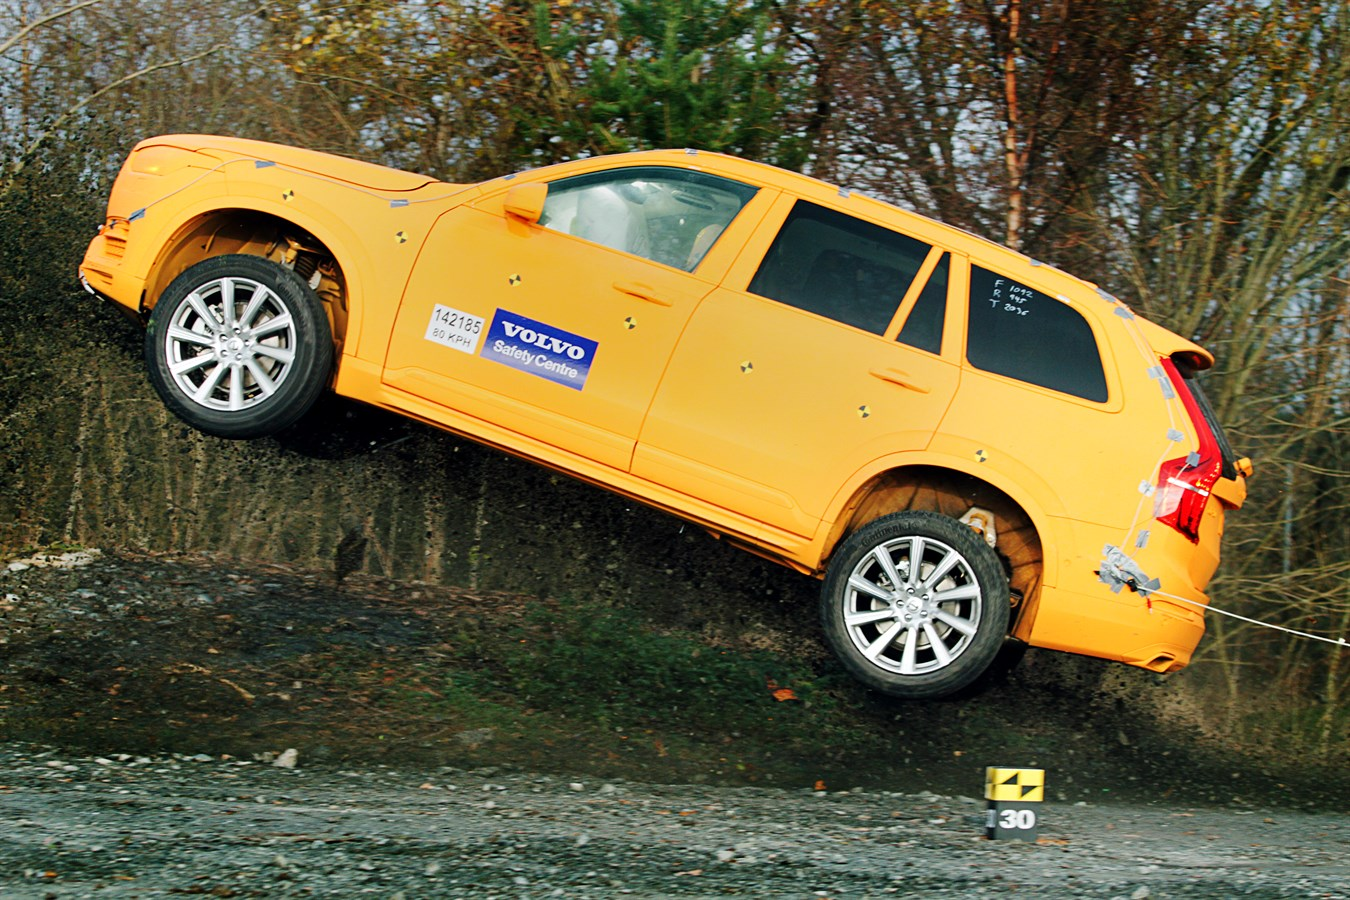 Volvo XC90 crash test  Volvo Car Group Global Media Newsroom